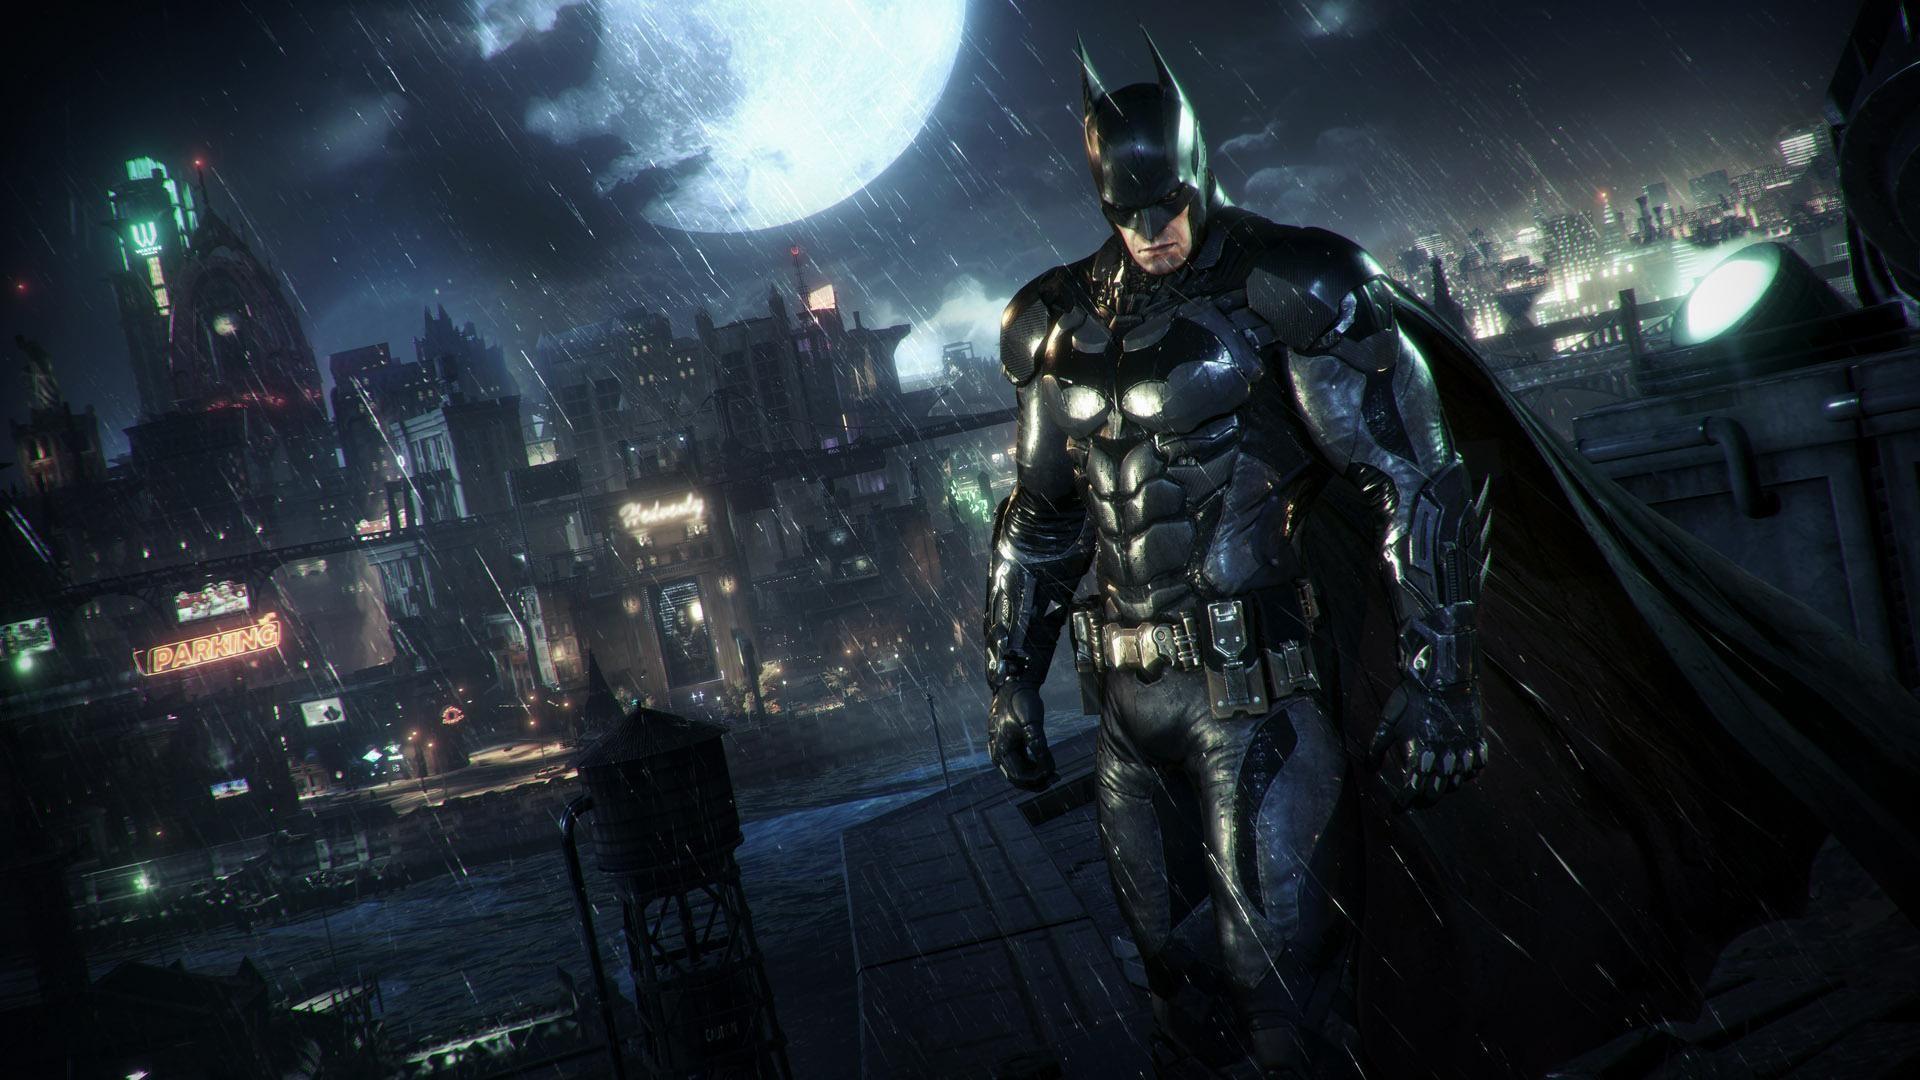 wallpaper.wiki-Free-Batman-Arkham-Knight-Game-Photos-